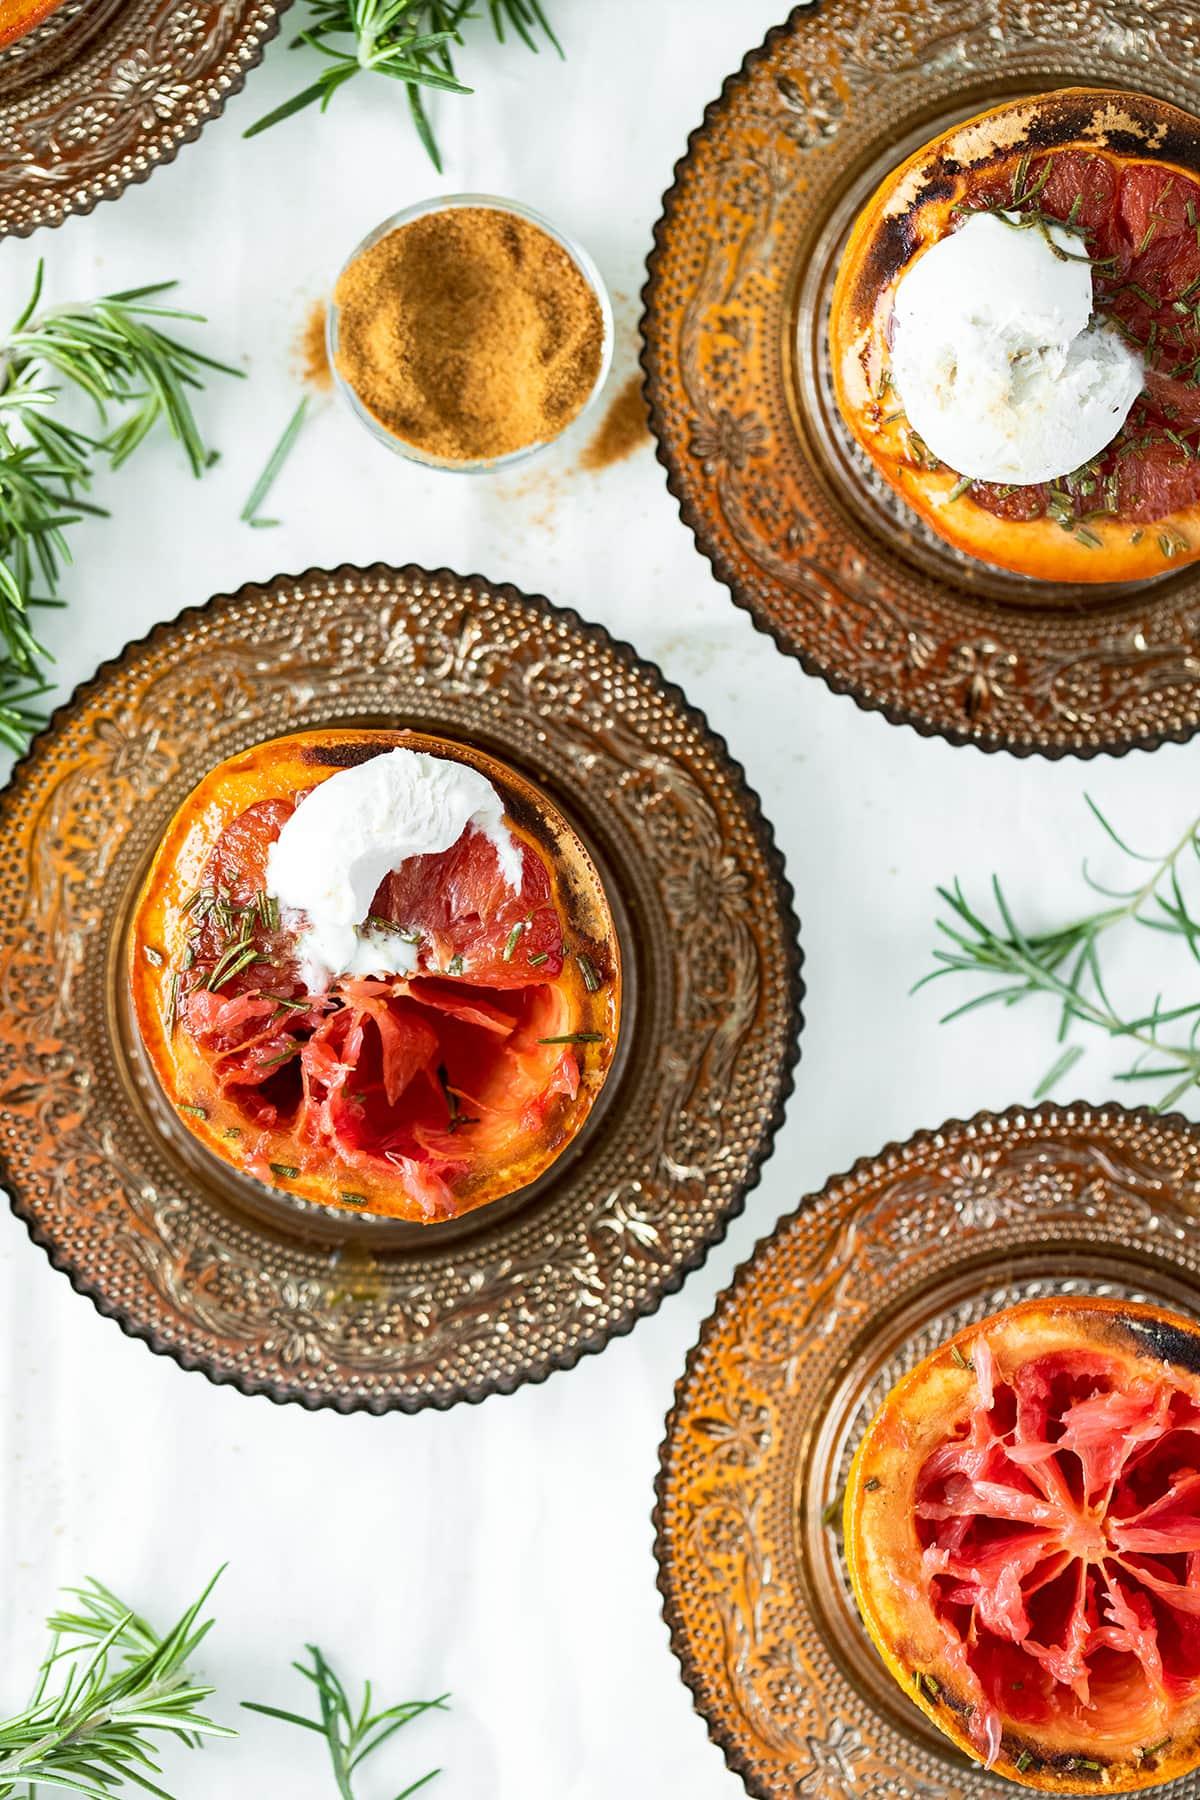 Broiled Grapefruit with Rosemary, Coconut Sugar, and Vegan Vanilla Ice Cream - The Healthful Ideas